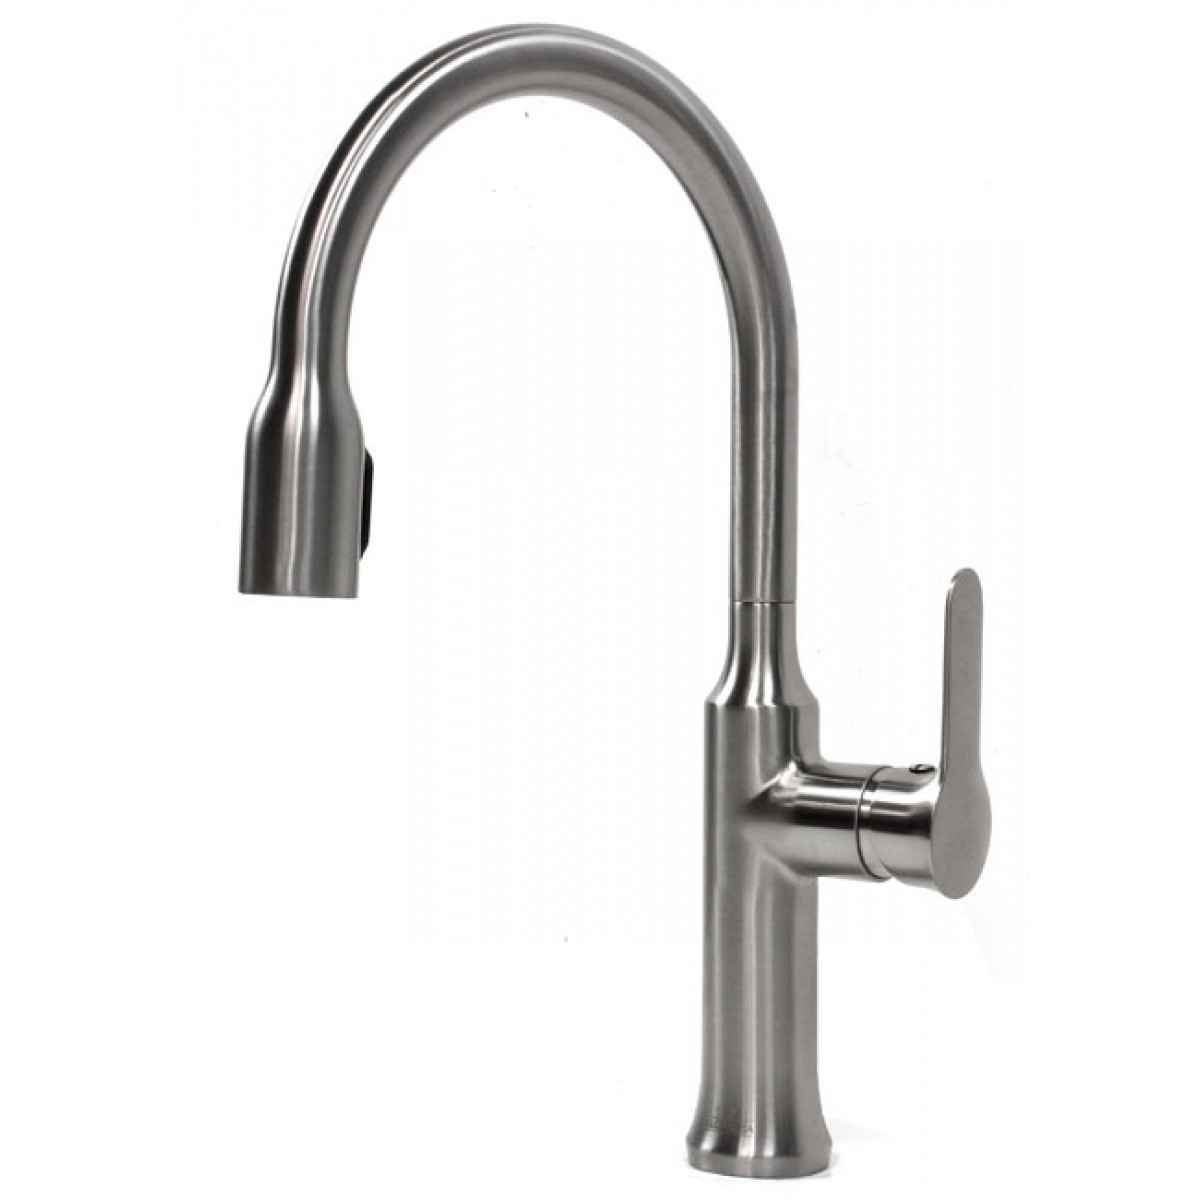 allora citadel design lead free brushed nickel kitchen bar faucet